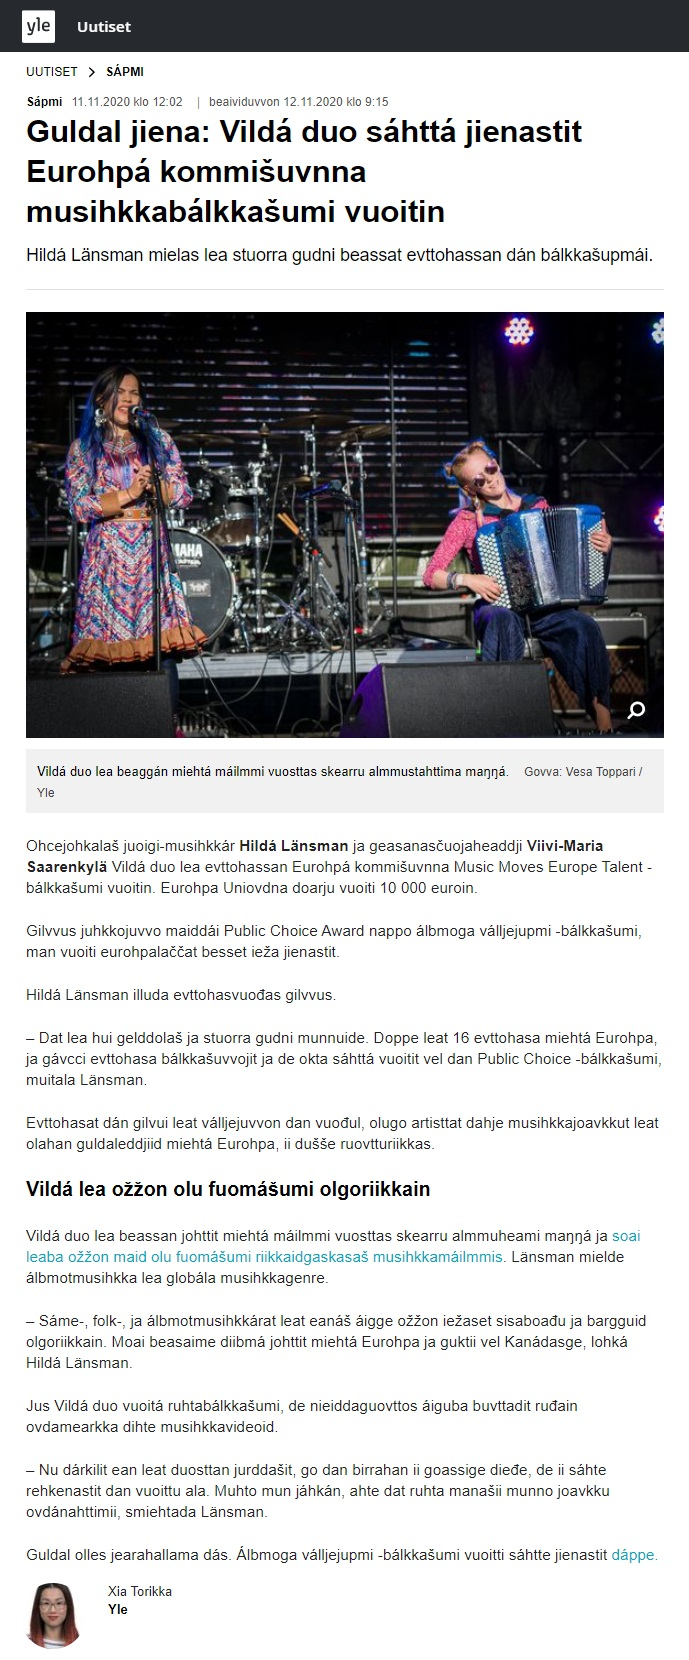 Yle Sápmi (Finland), 11.11.2020